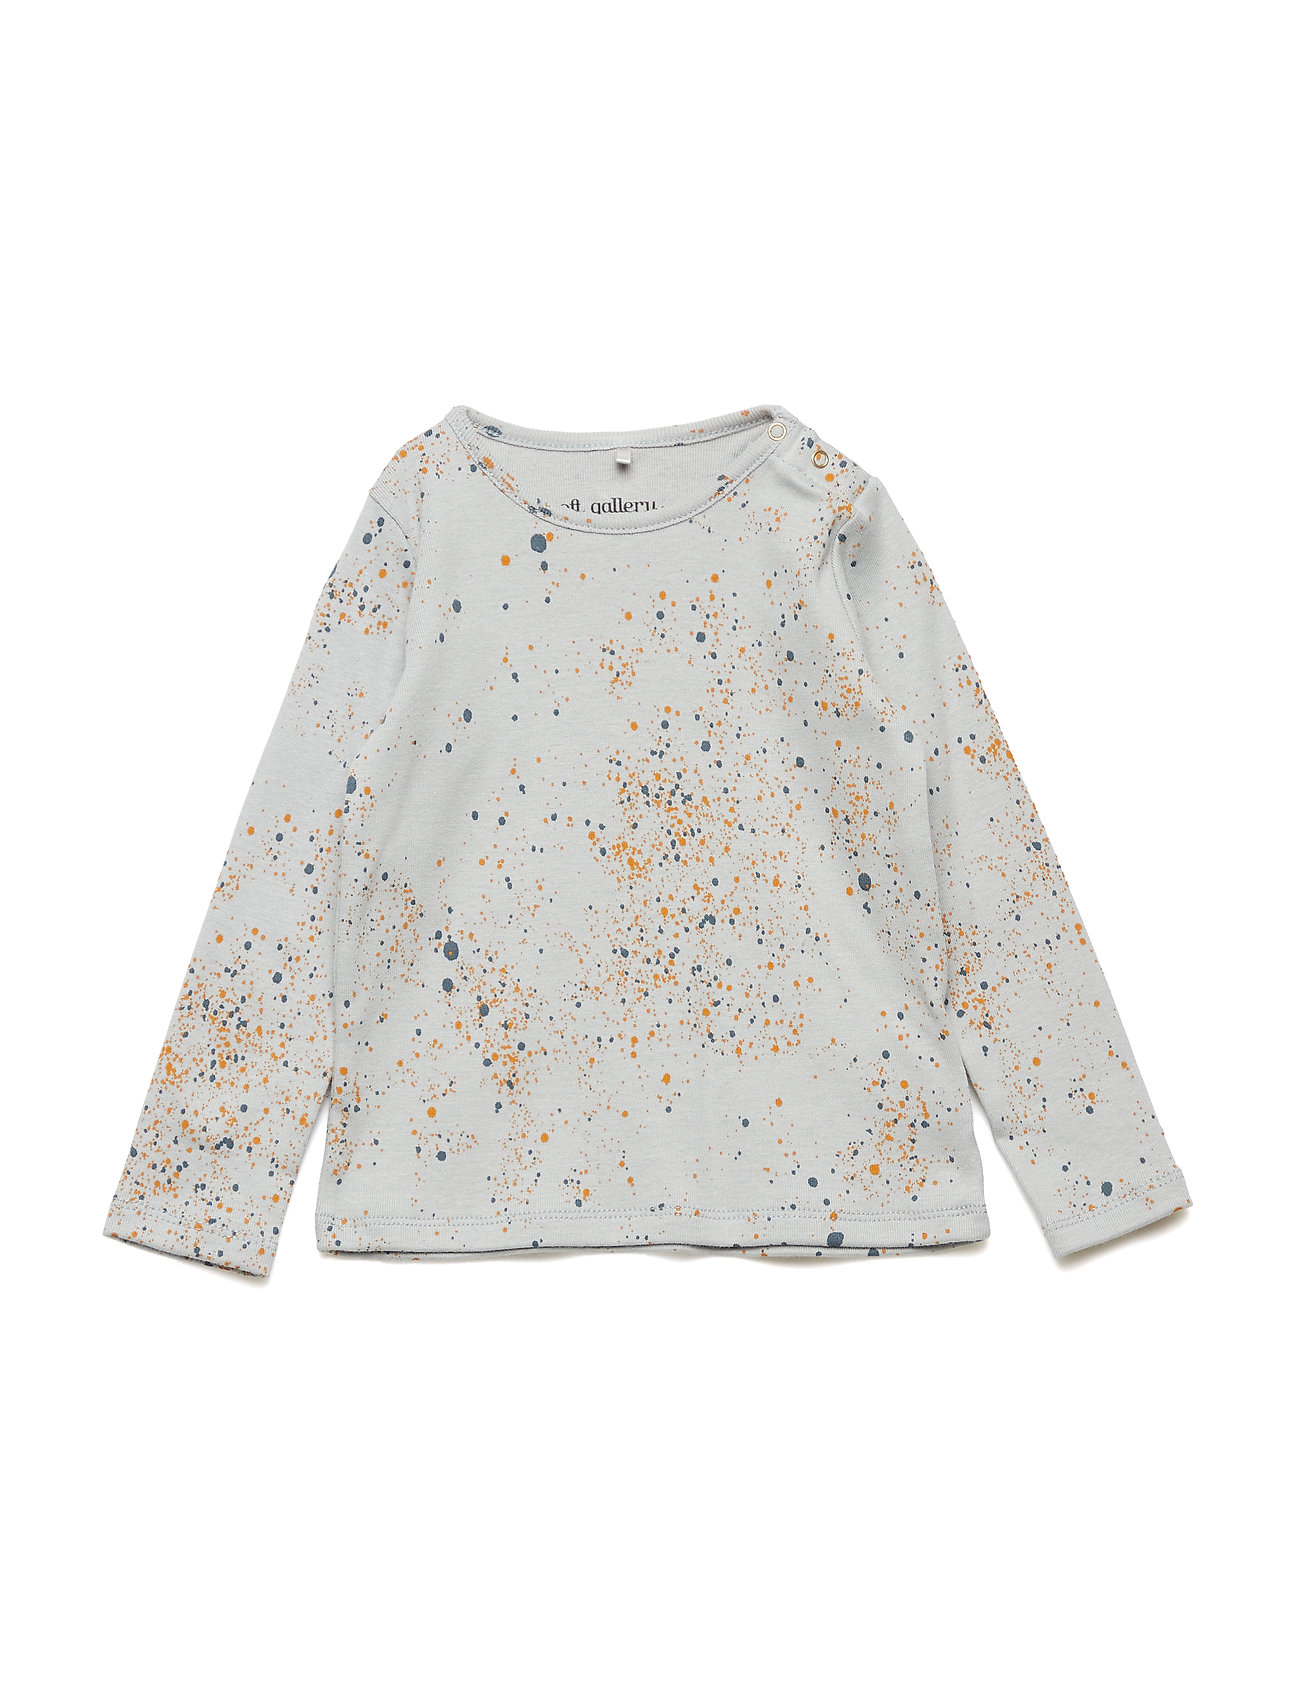 Image of Baby Bella T-Shirt Langærmet T-shirt Creme SOFT GALLERY (3079231301)